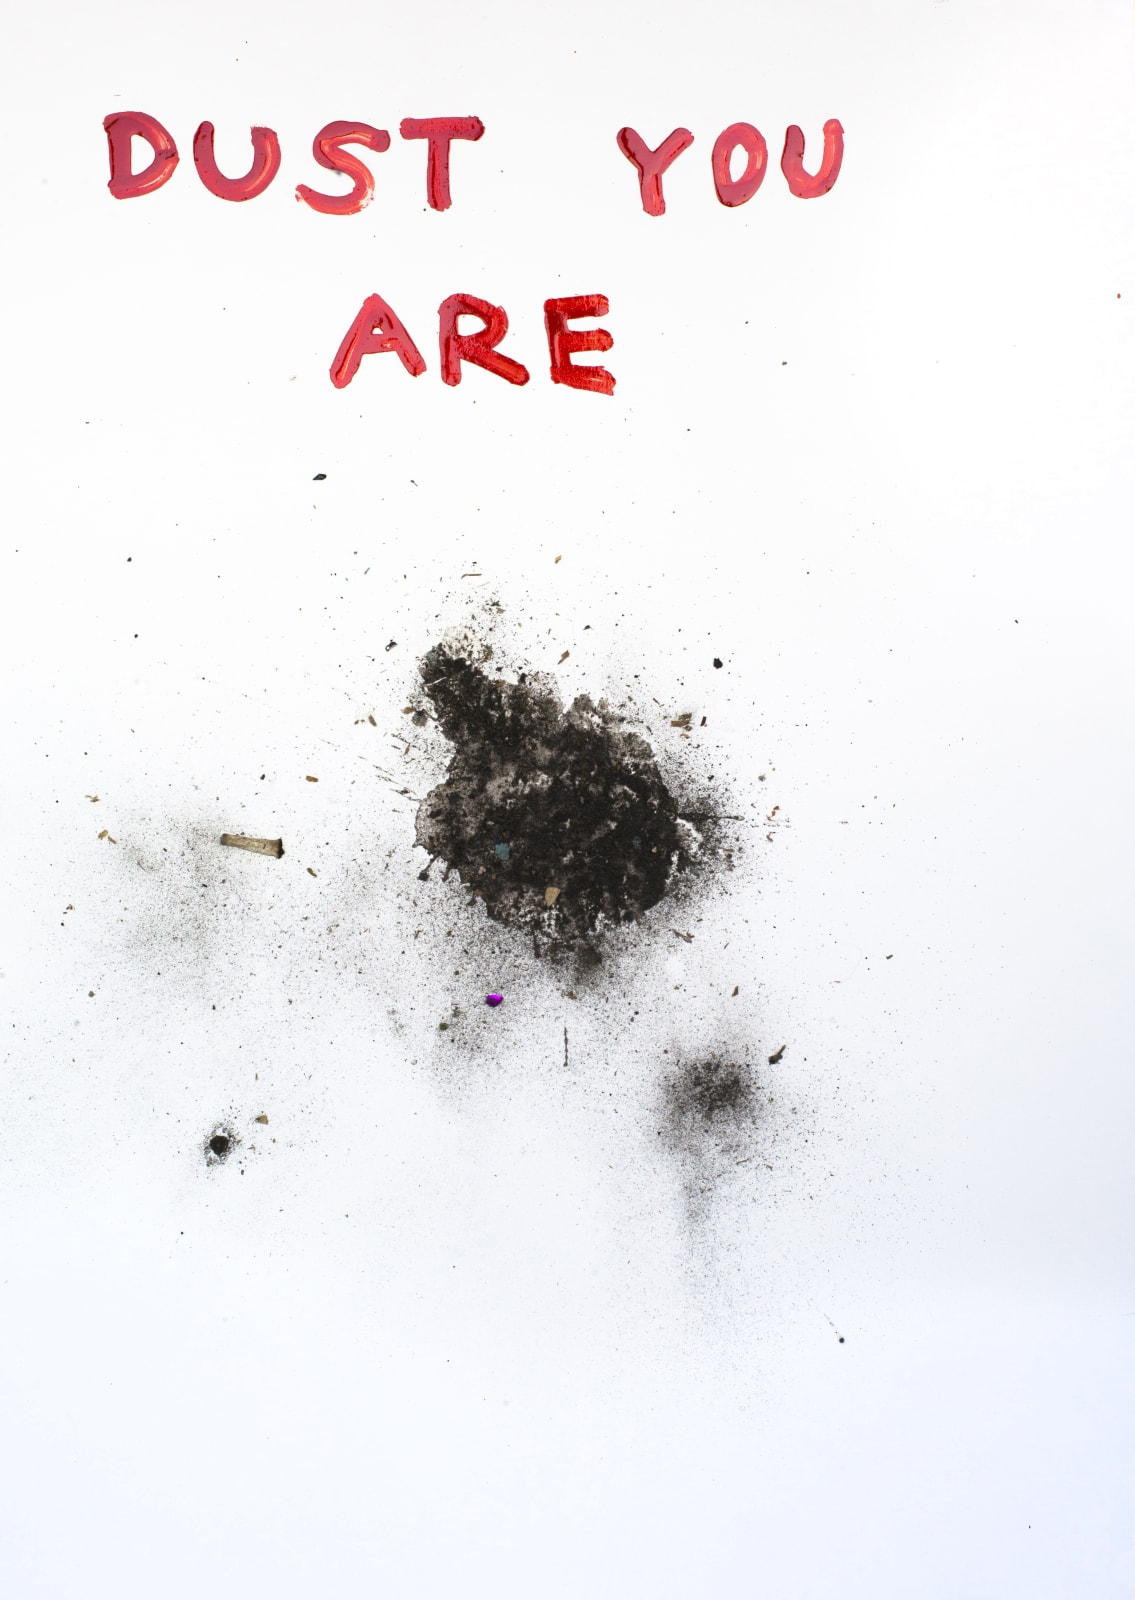 Krištof Kintera, Dust you are, 2018